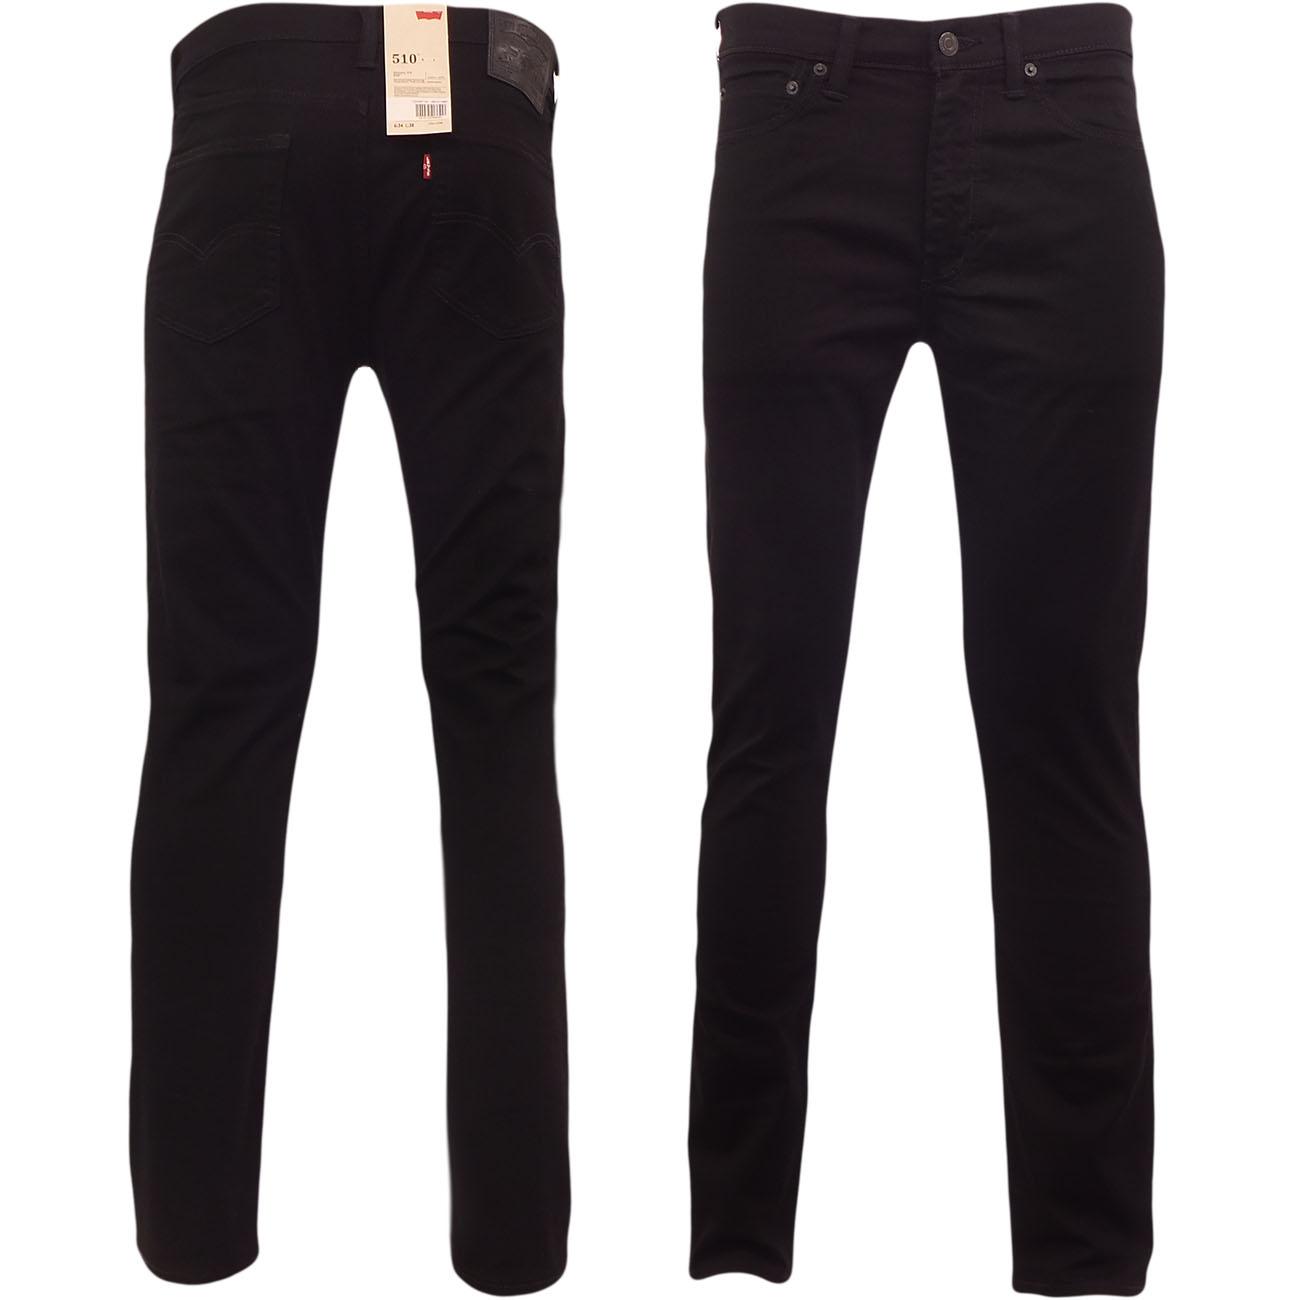 3524b79cb48 Details about Levi 510 Skinny Slim Fit Jean Levi s Denim Trouser Pant Jeans